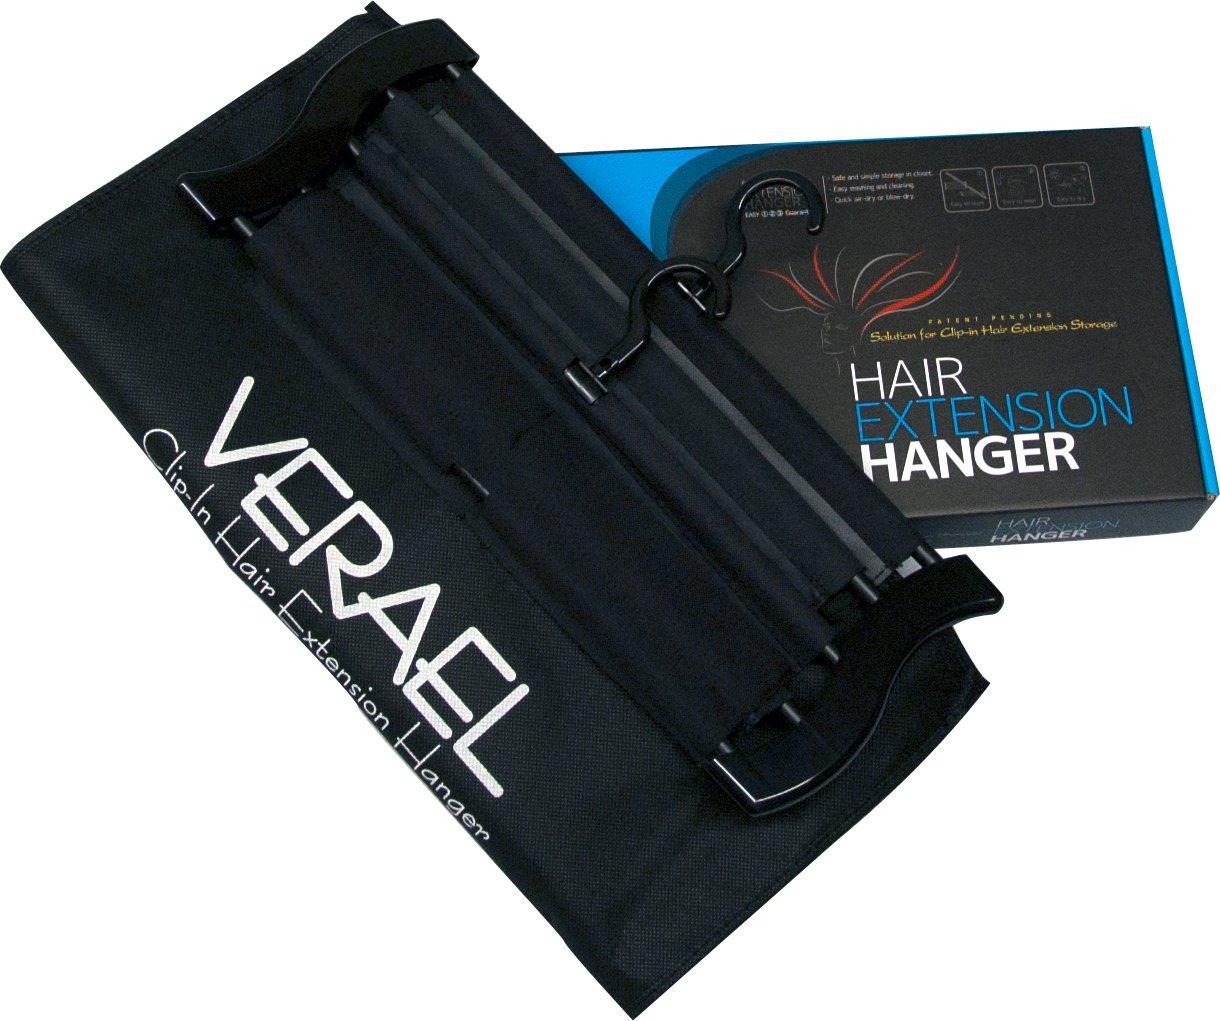 Verael Hair Extension Hanger